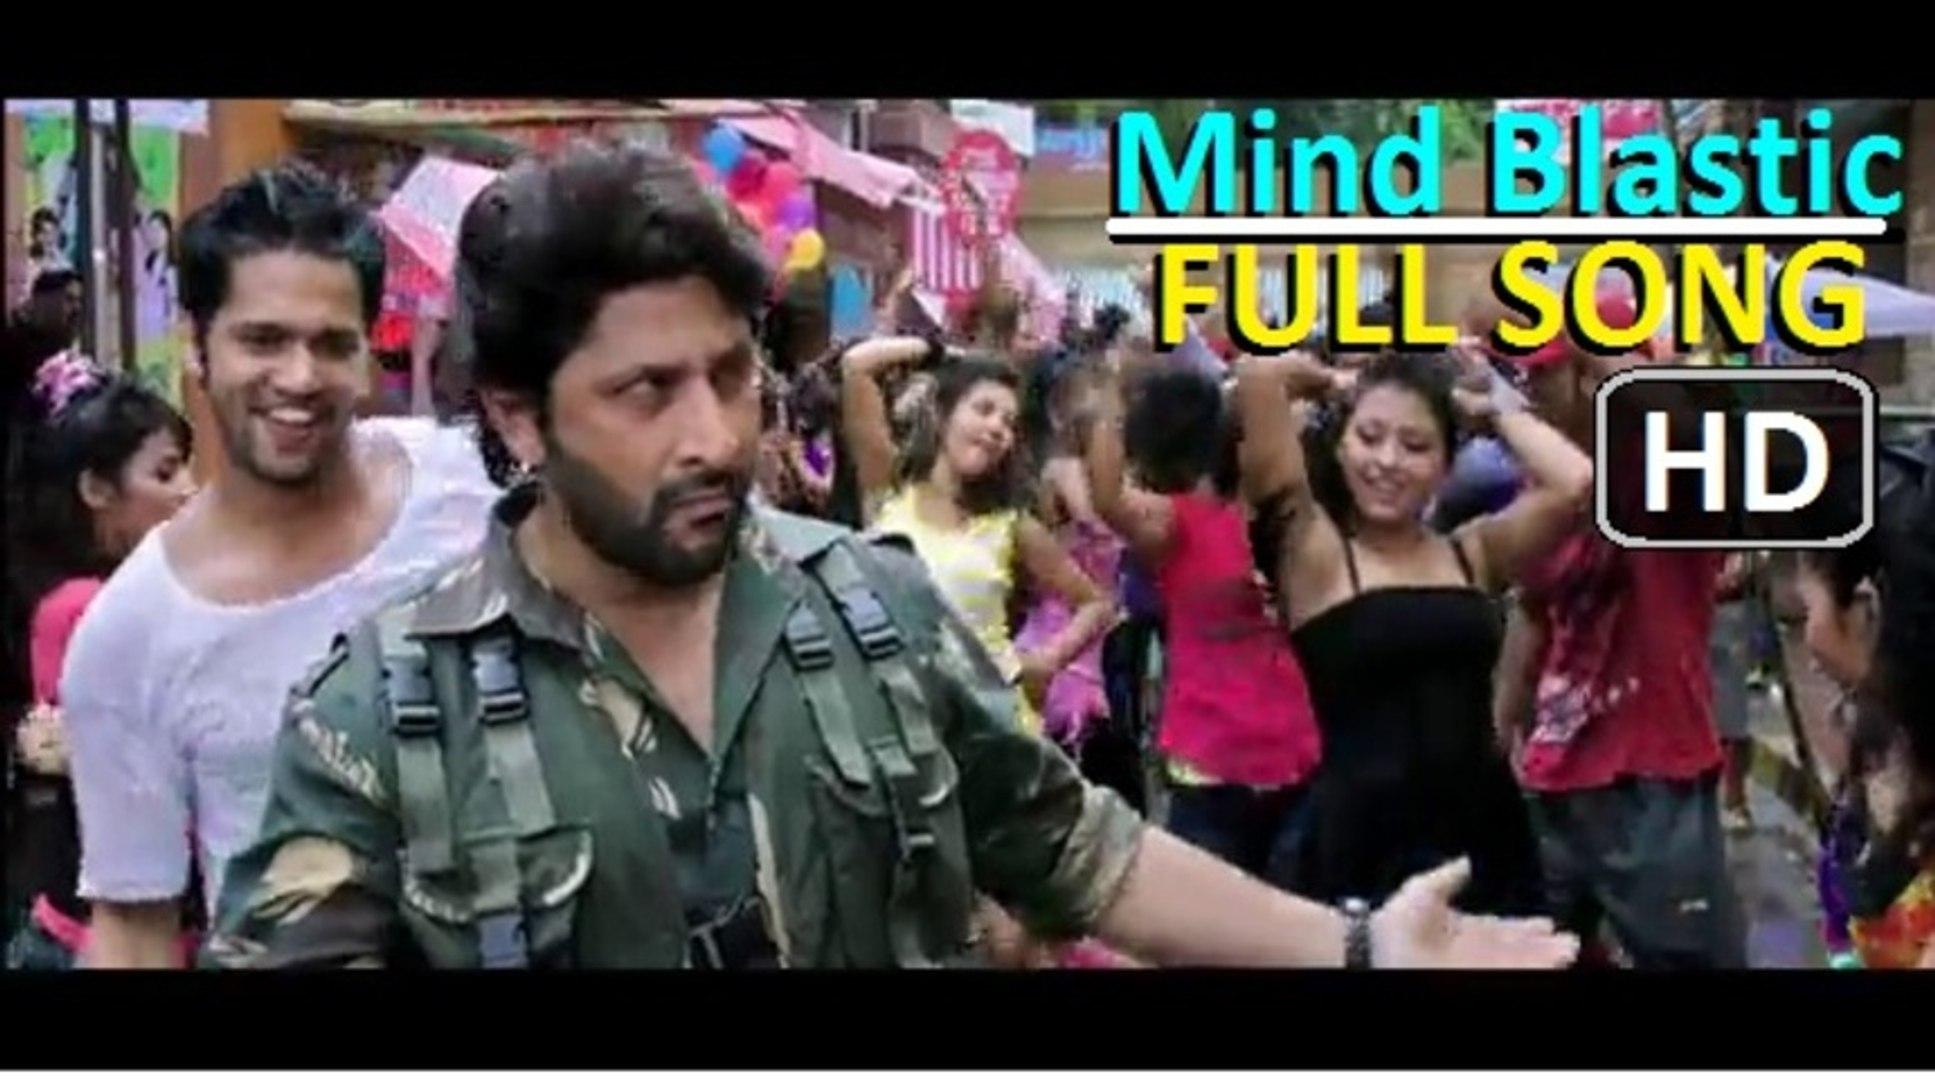 Banda Mind Blastic Official Song | Mr Joe B. Carvalho Trailer 2014 | Banda Mind Blastic Full Song